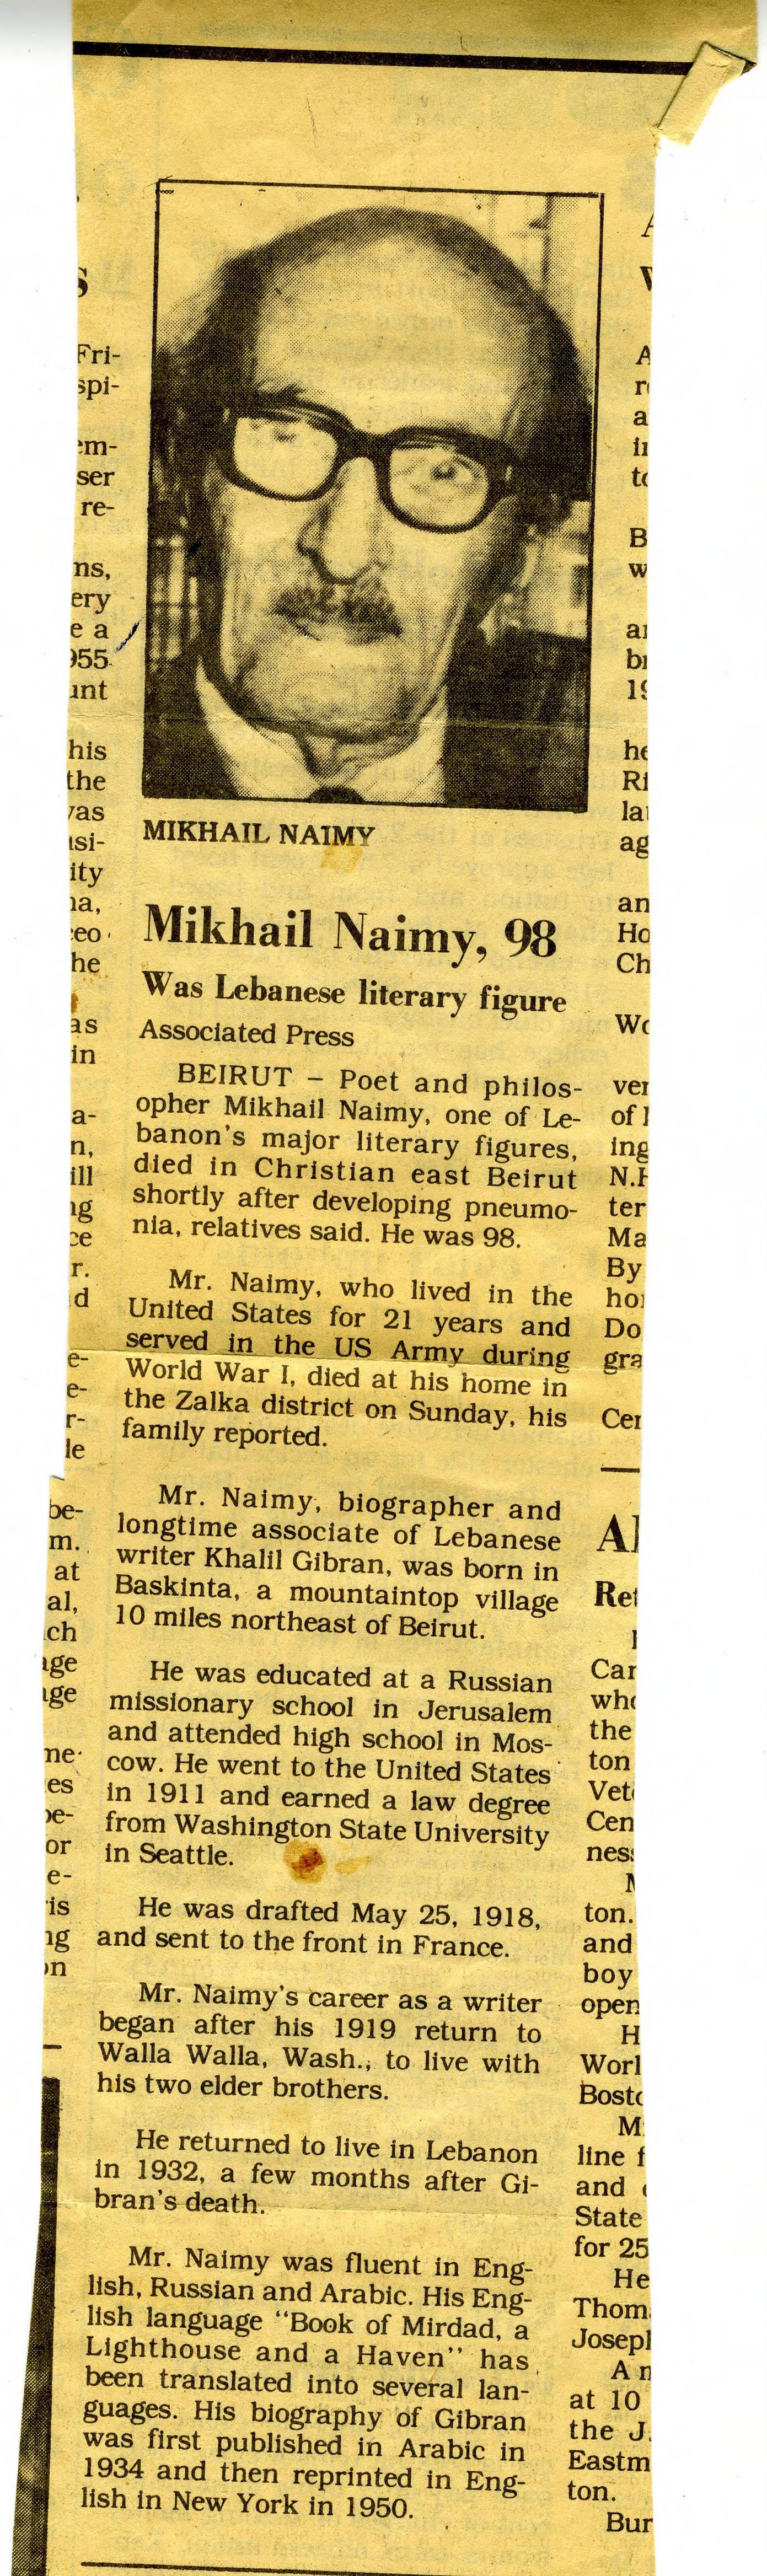 Associated Press, Obituary - Mikhail Naimy, Unknown Newspaper, February 1988.